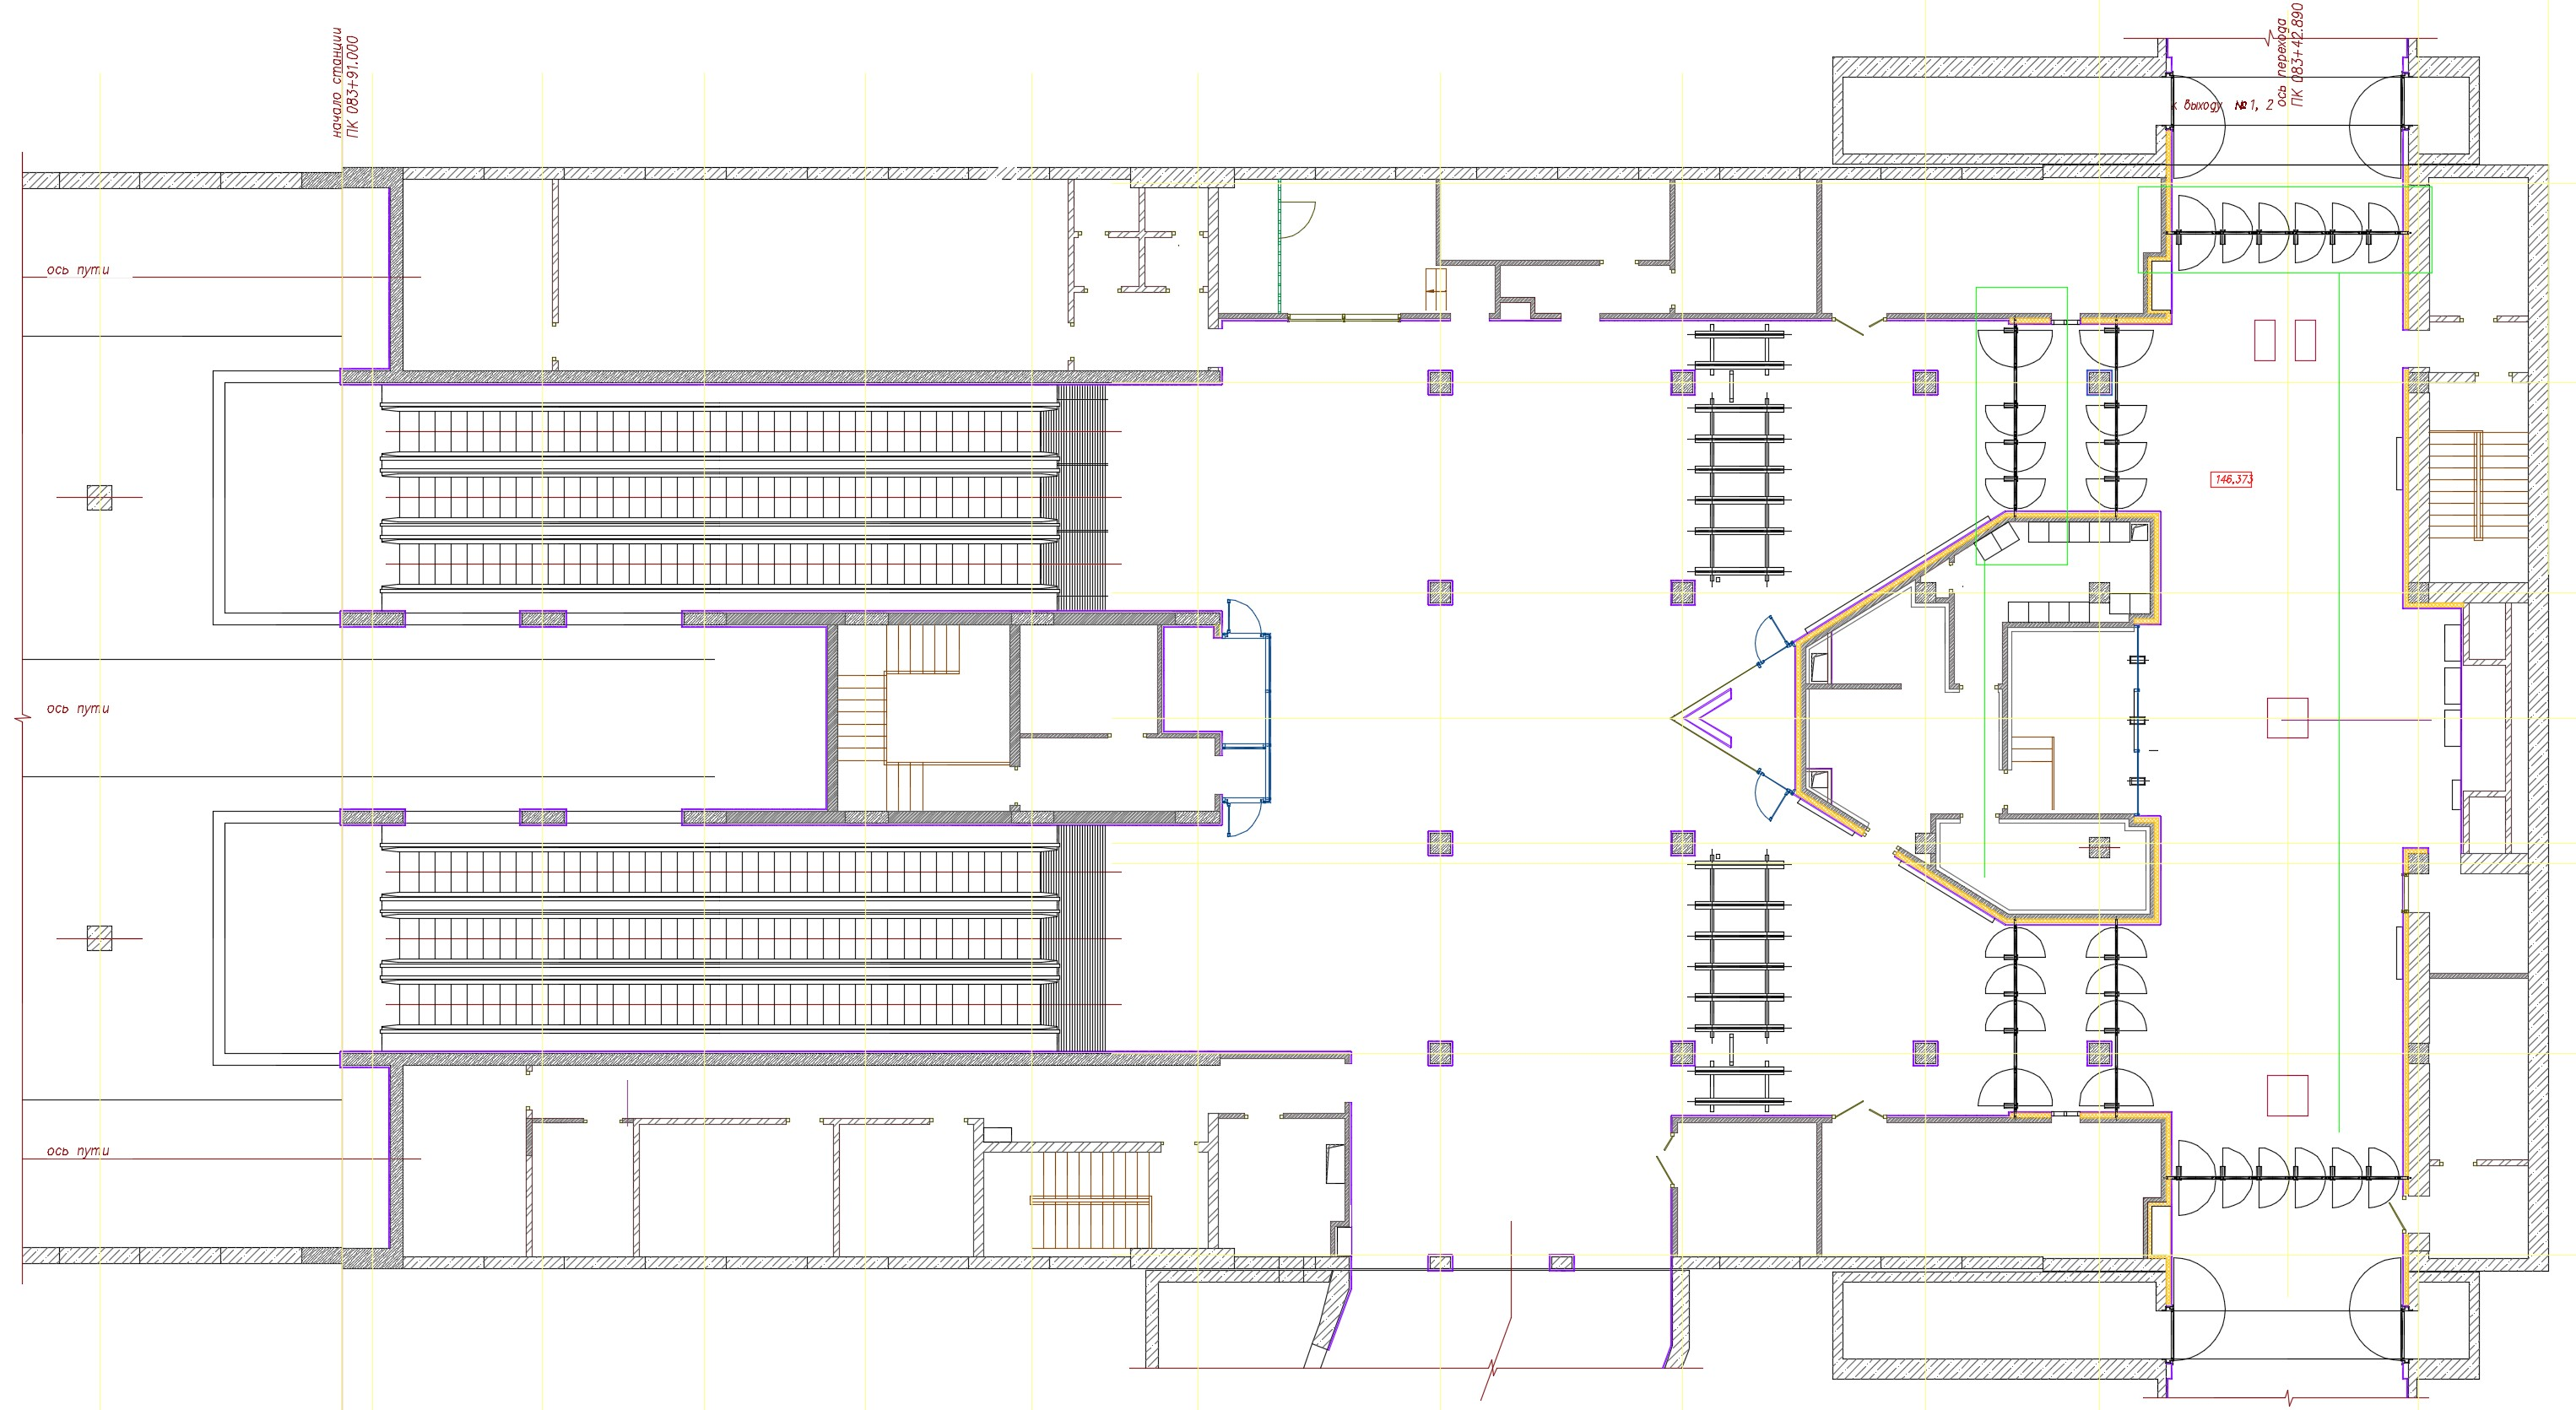 схема вестибюля.jpg